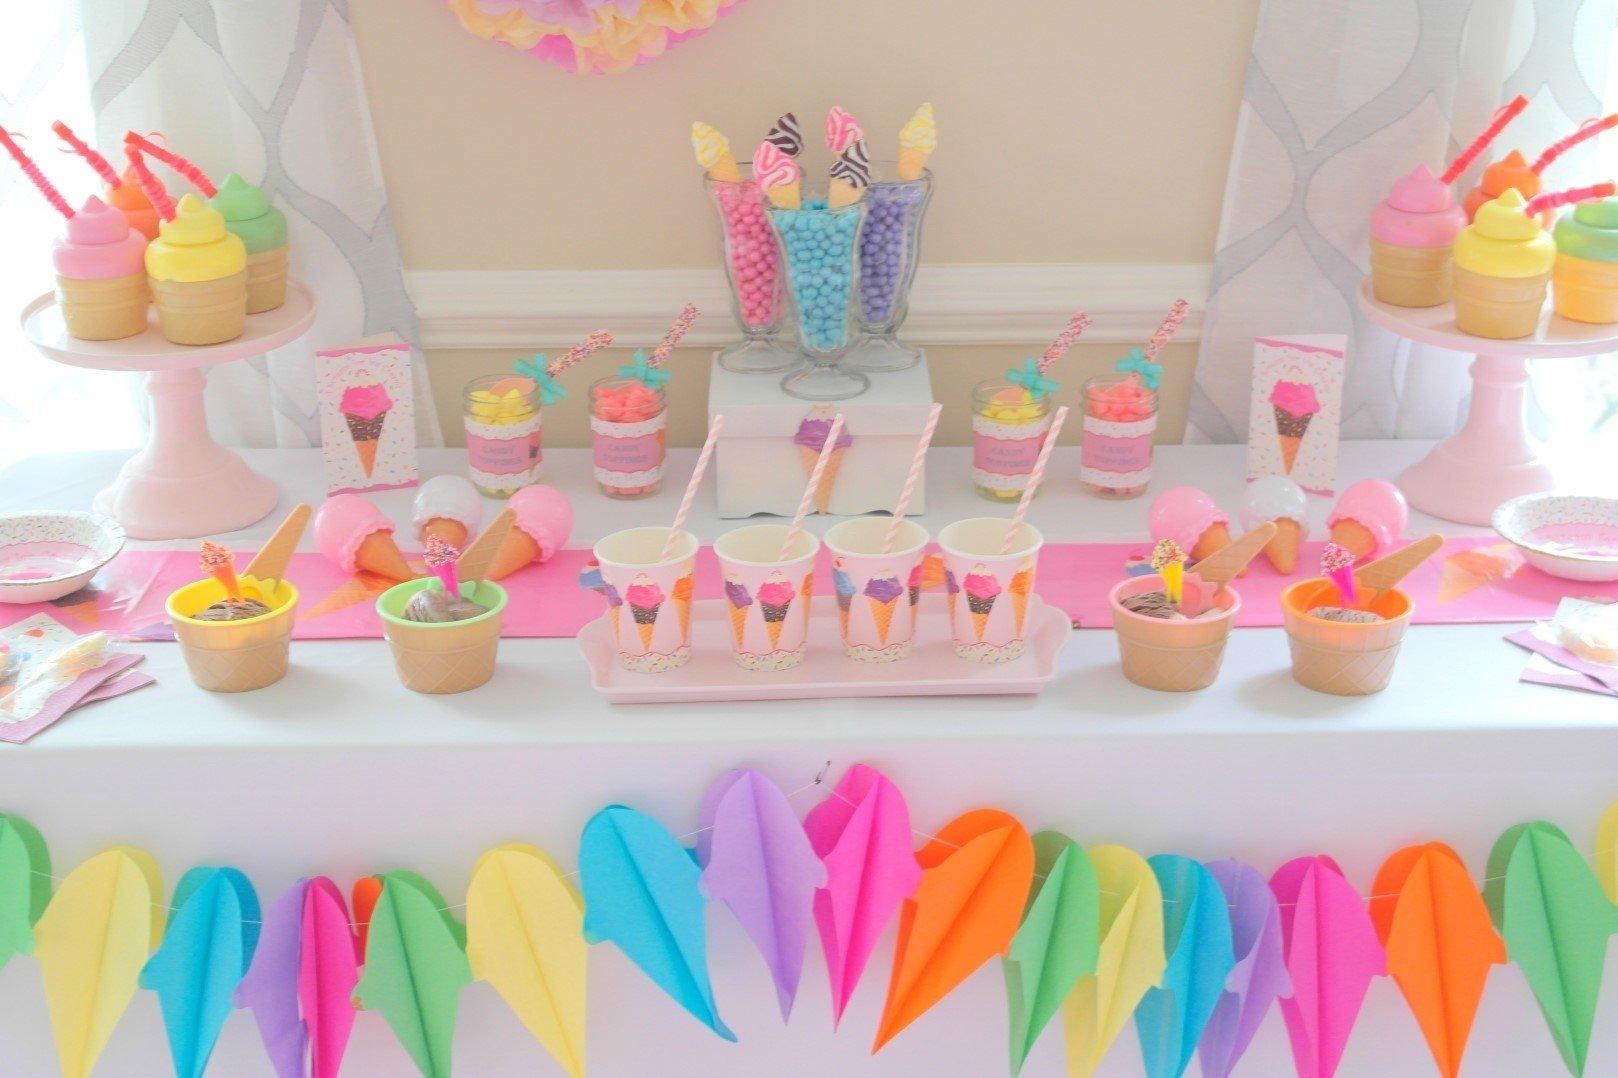 10 Fabulous Ice Cream Birthday Party Ideas ice cream party crafthubs 2020